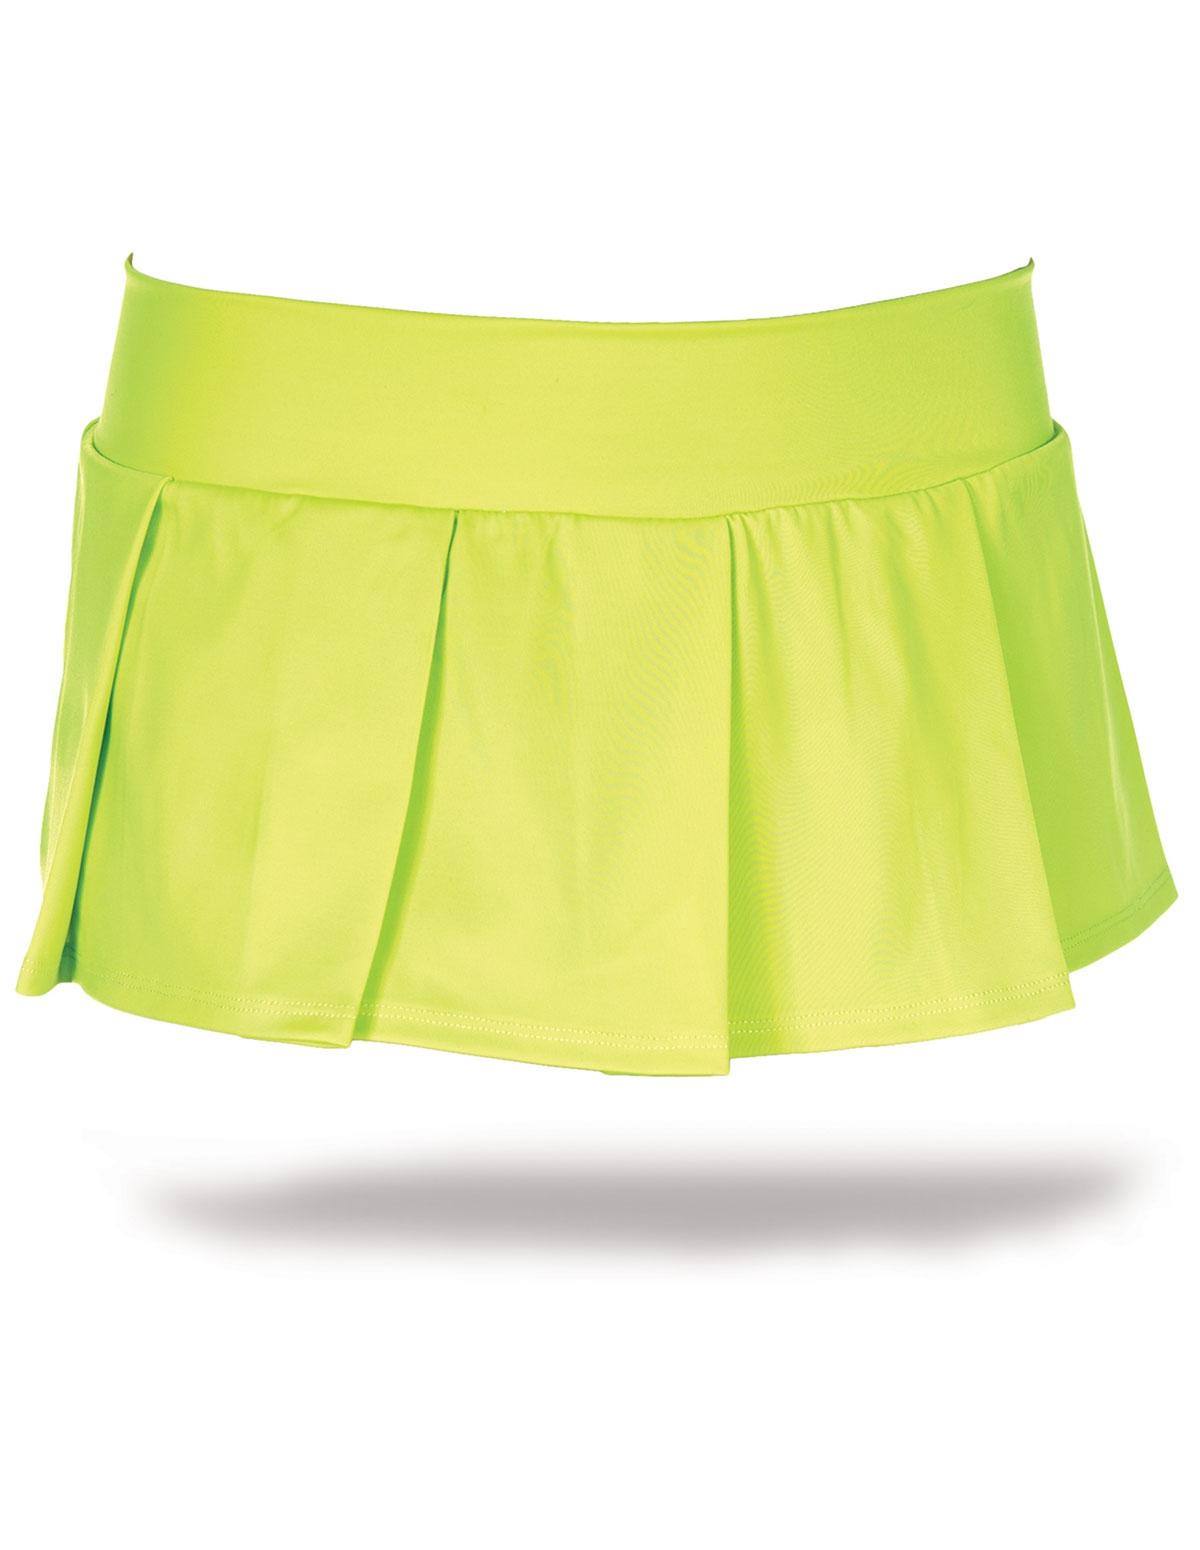 Solid School Girl Skirt